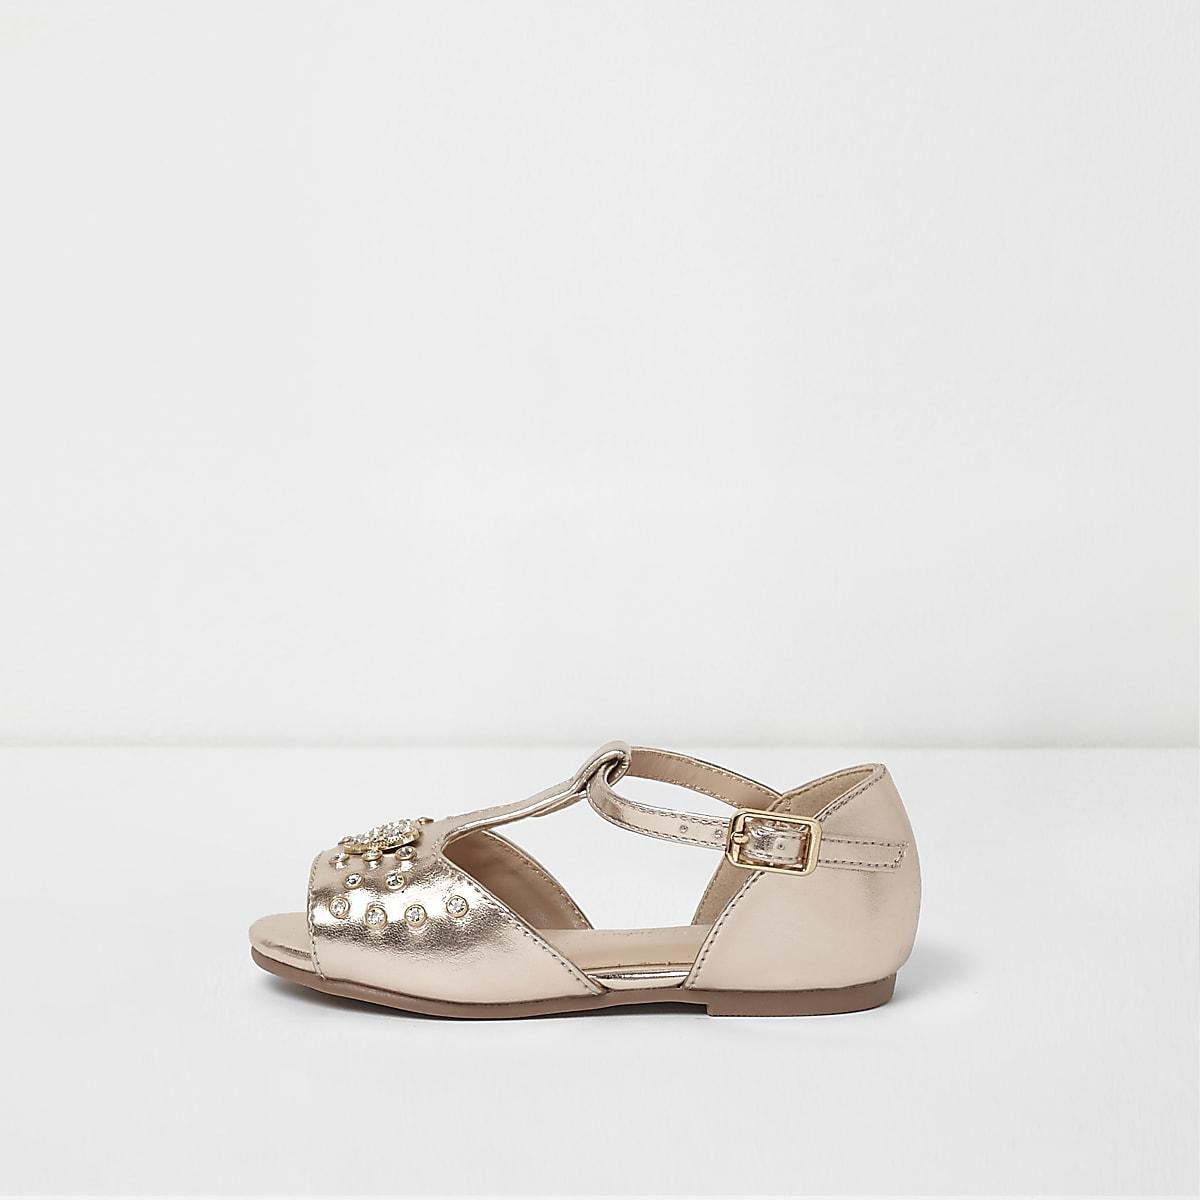 88597a8ce1ae Mini girls rose gold metallic T bar sandals - Baby Girls Shoes - Baby Girls  Shoes   Boots - Mini Girls - girls